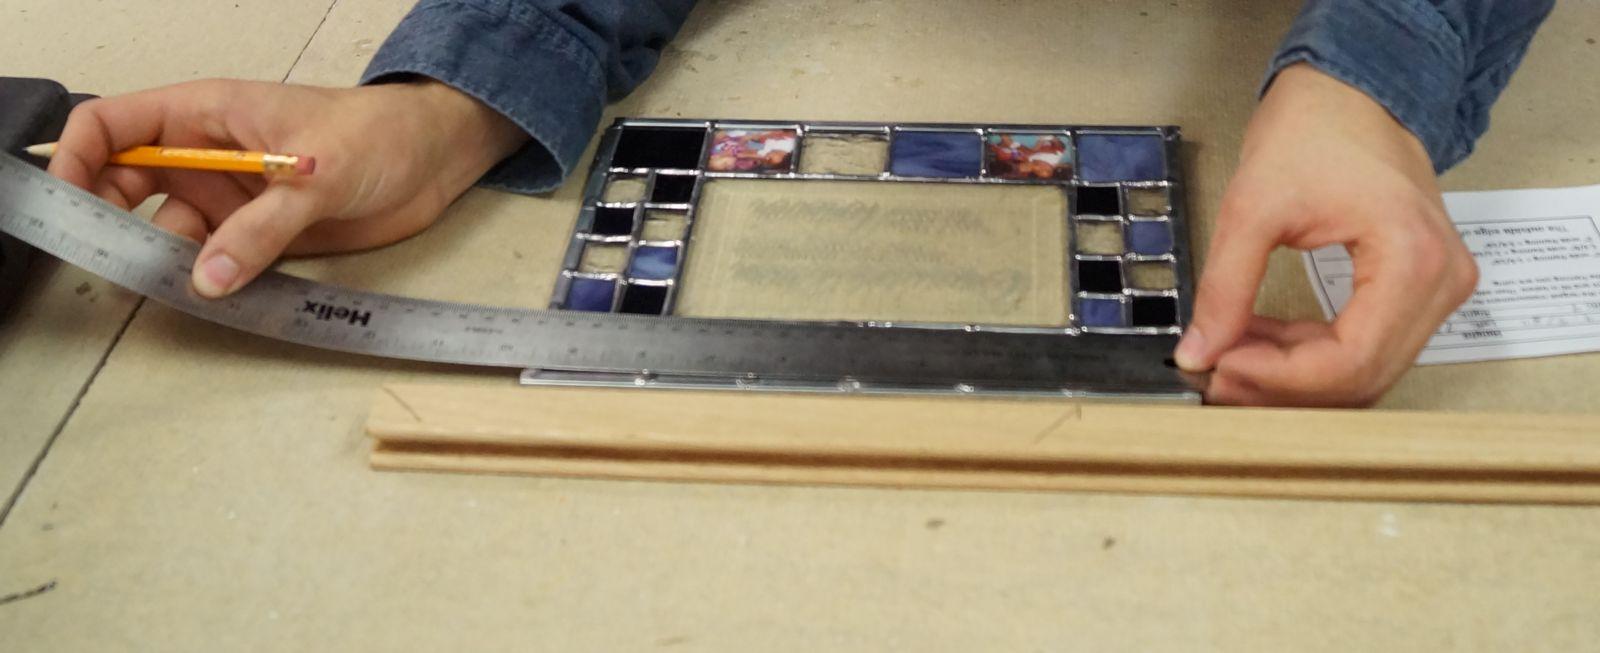 Measure your panel. Record measurements.